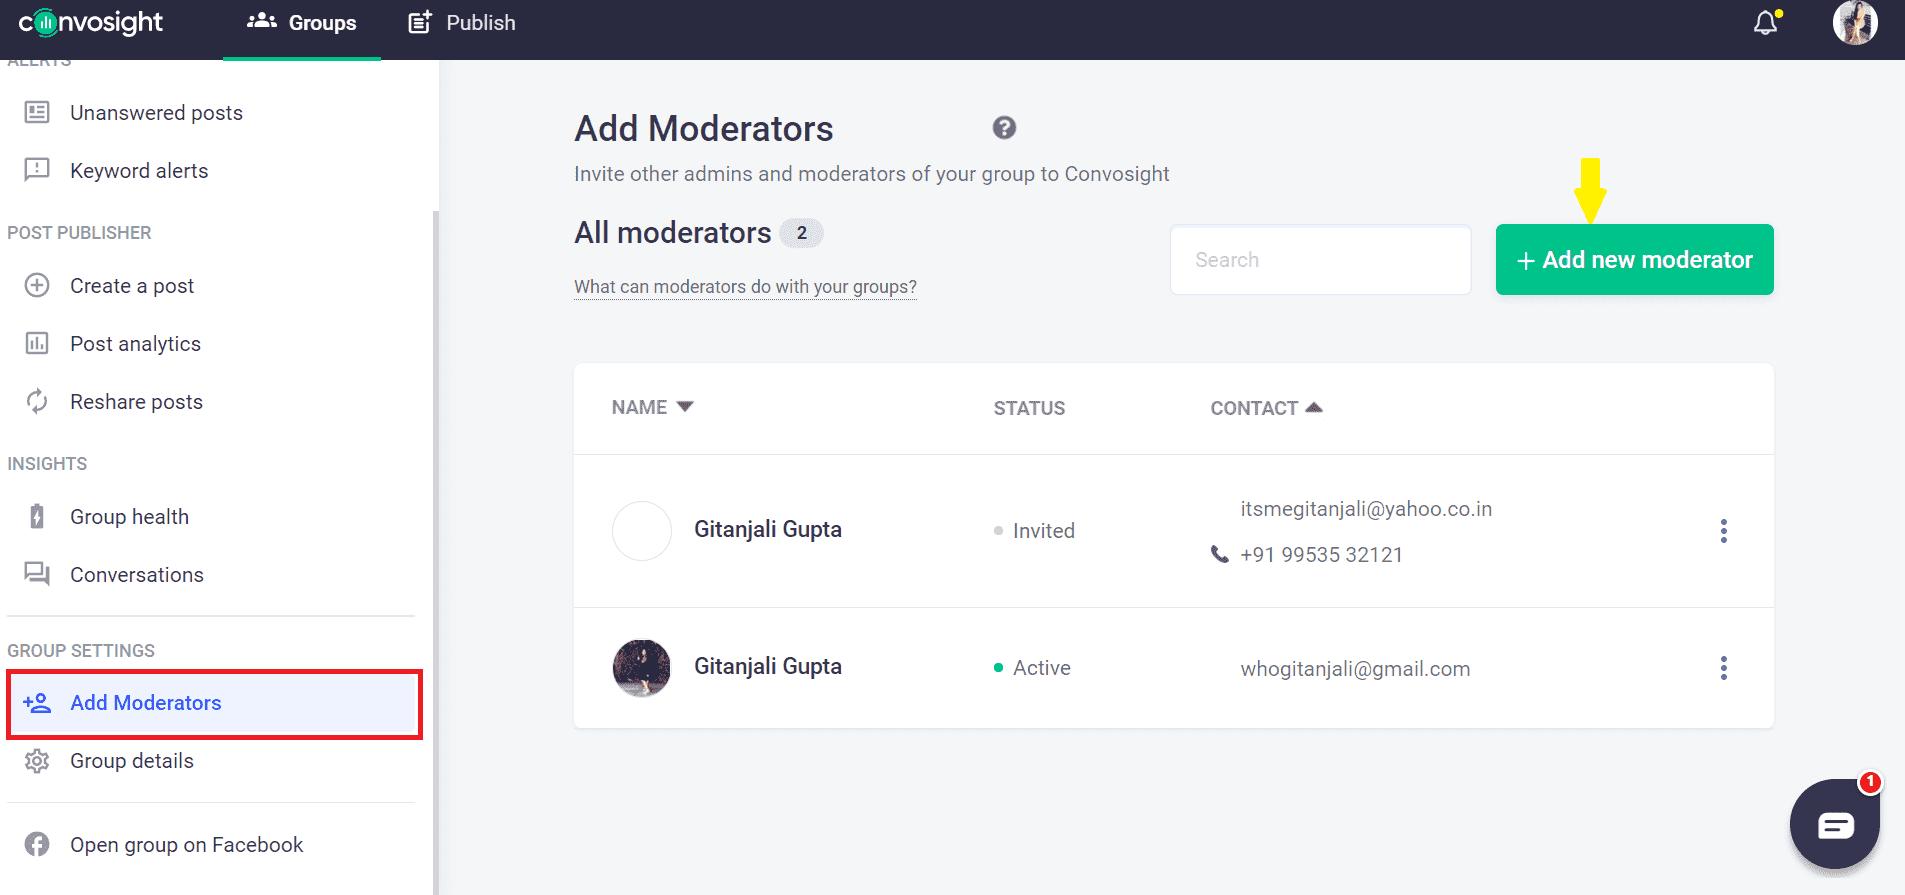 add moderator by Convosight Dashboard